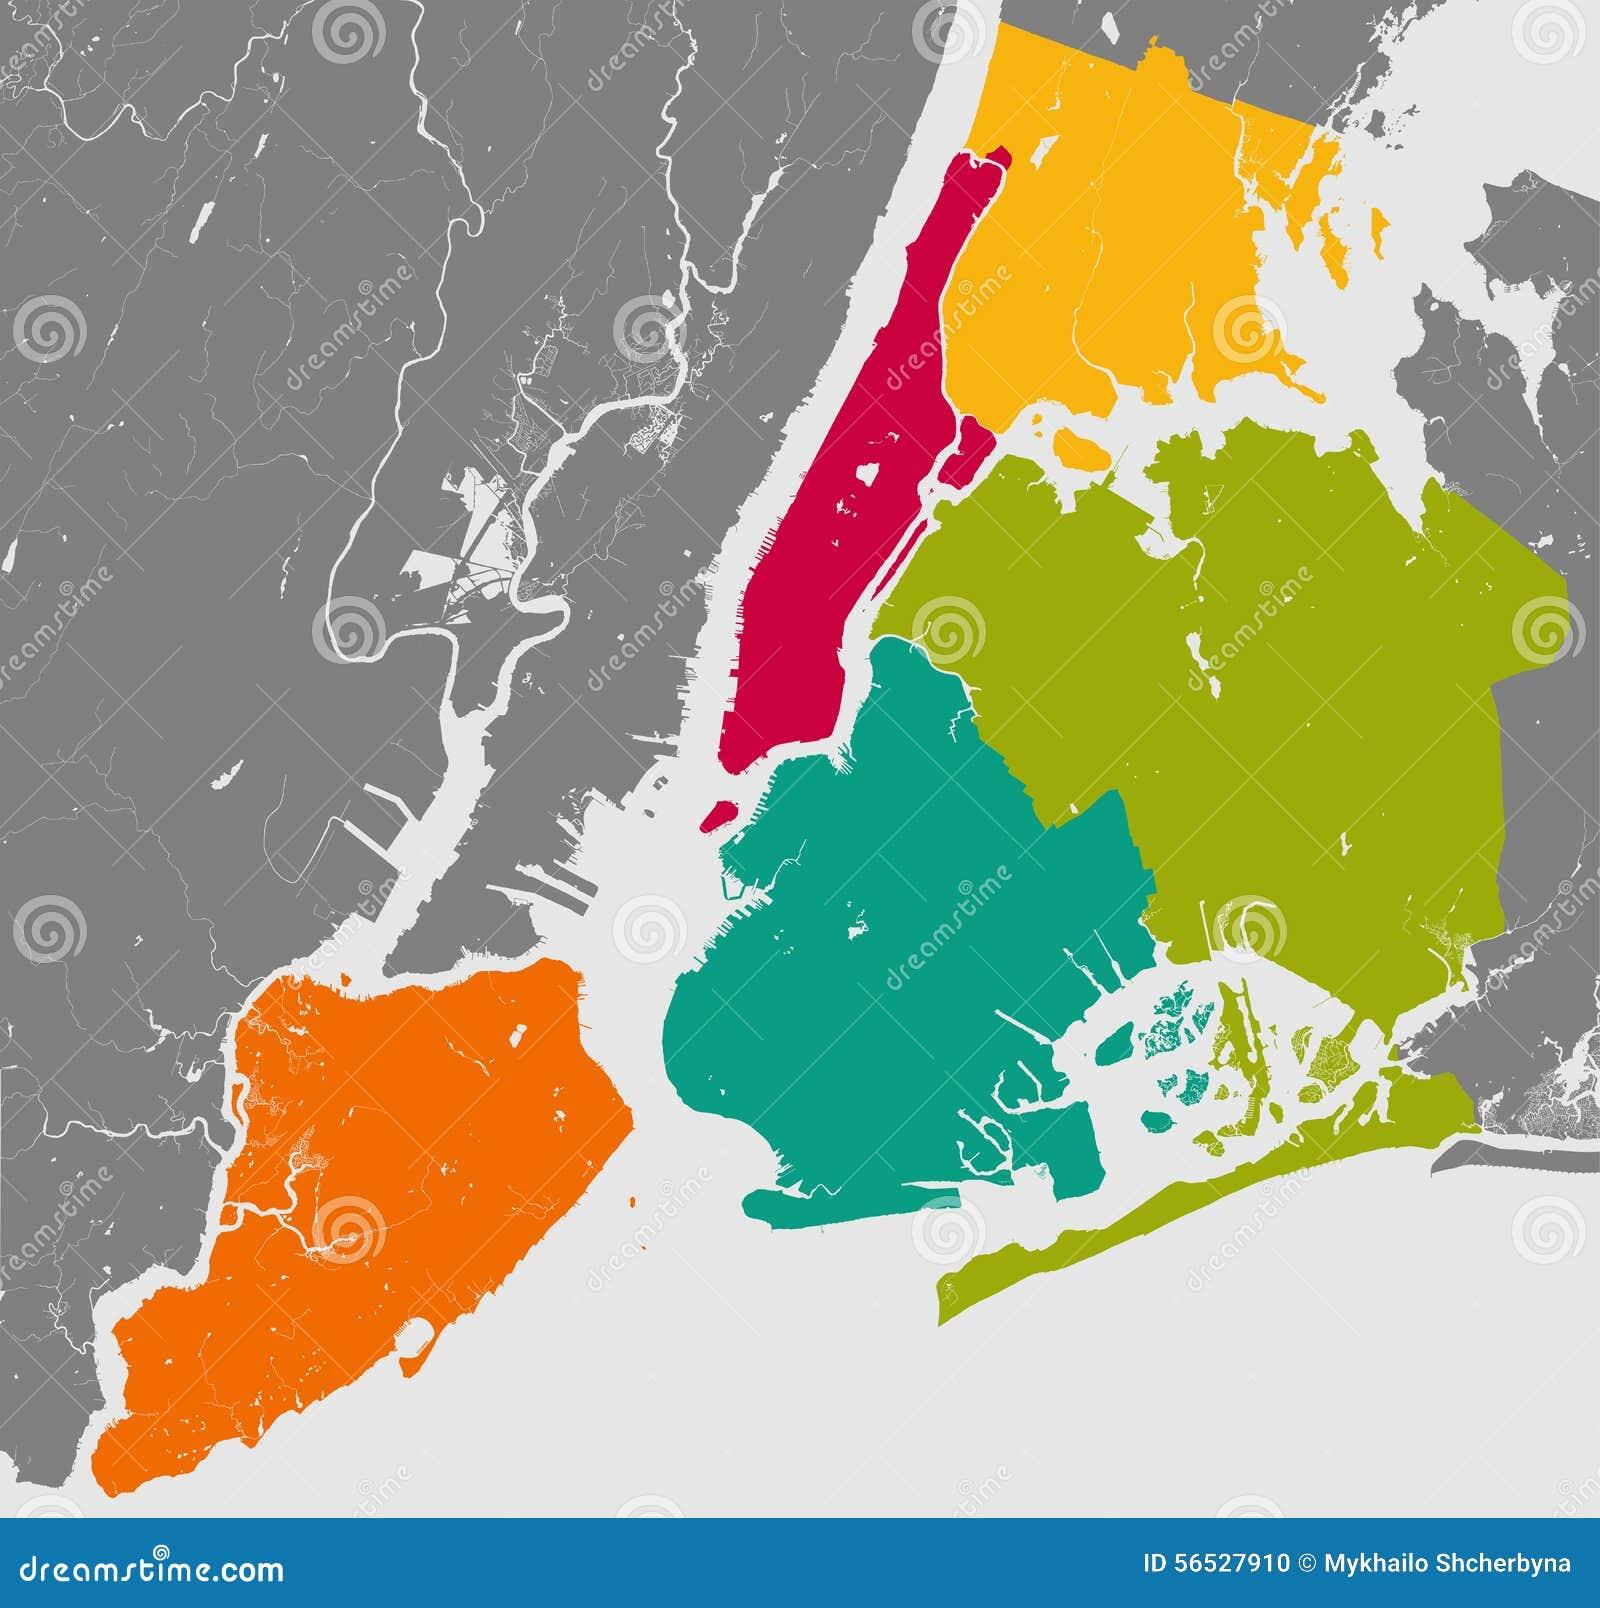 Web Designers On Long Island